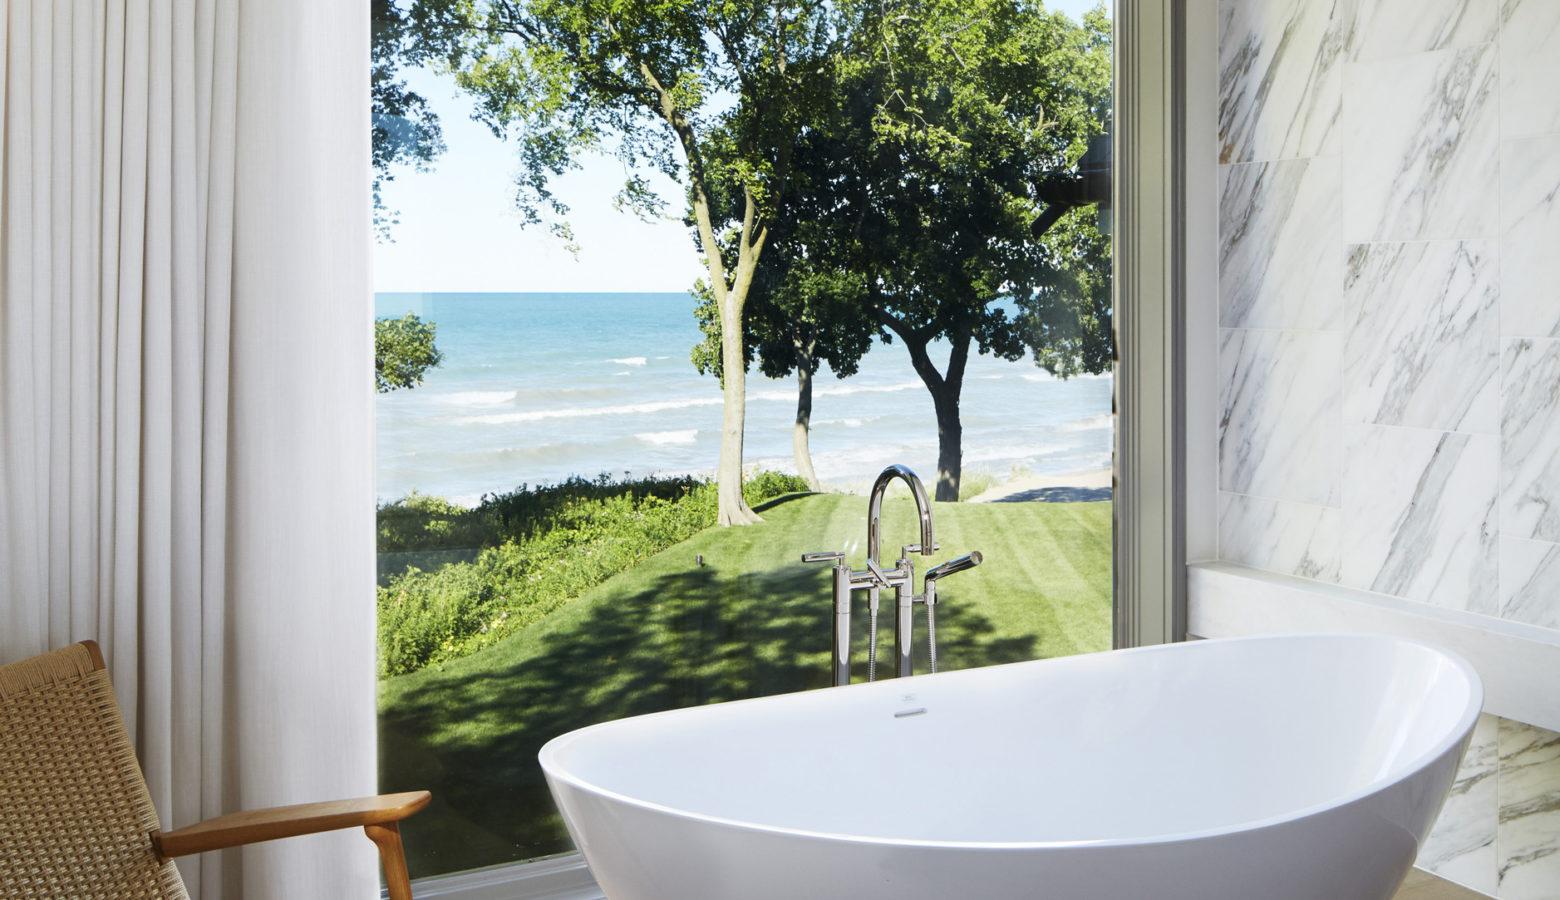 Biophilic Design: Bringing the Outdoors In